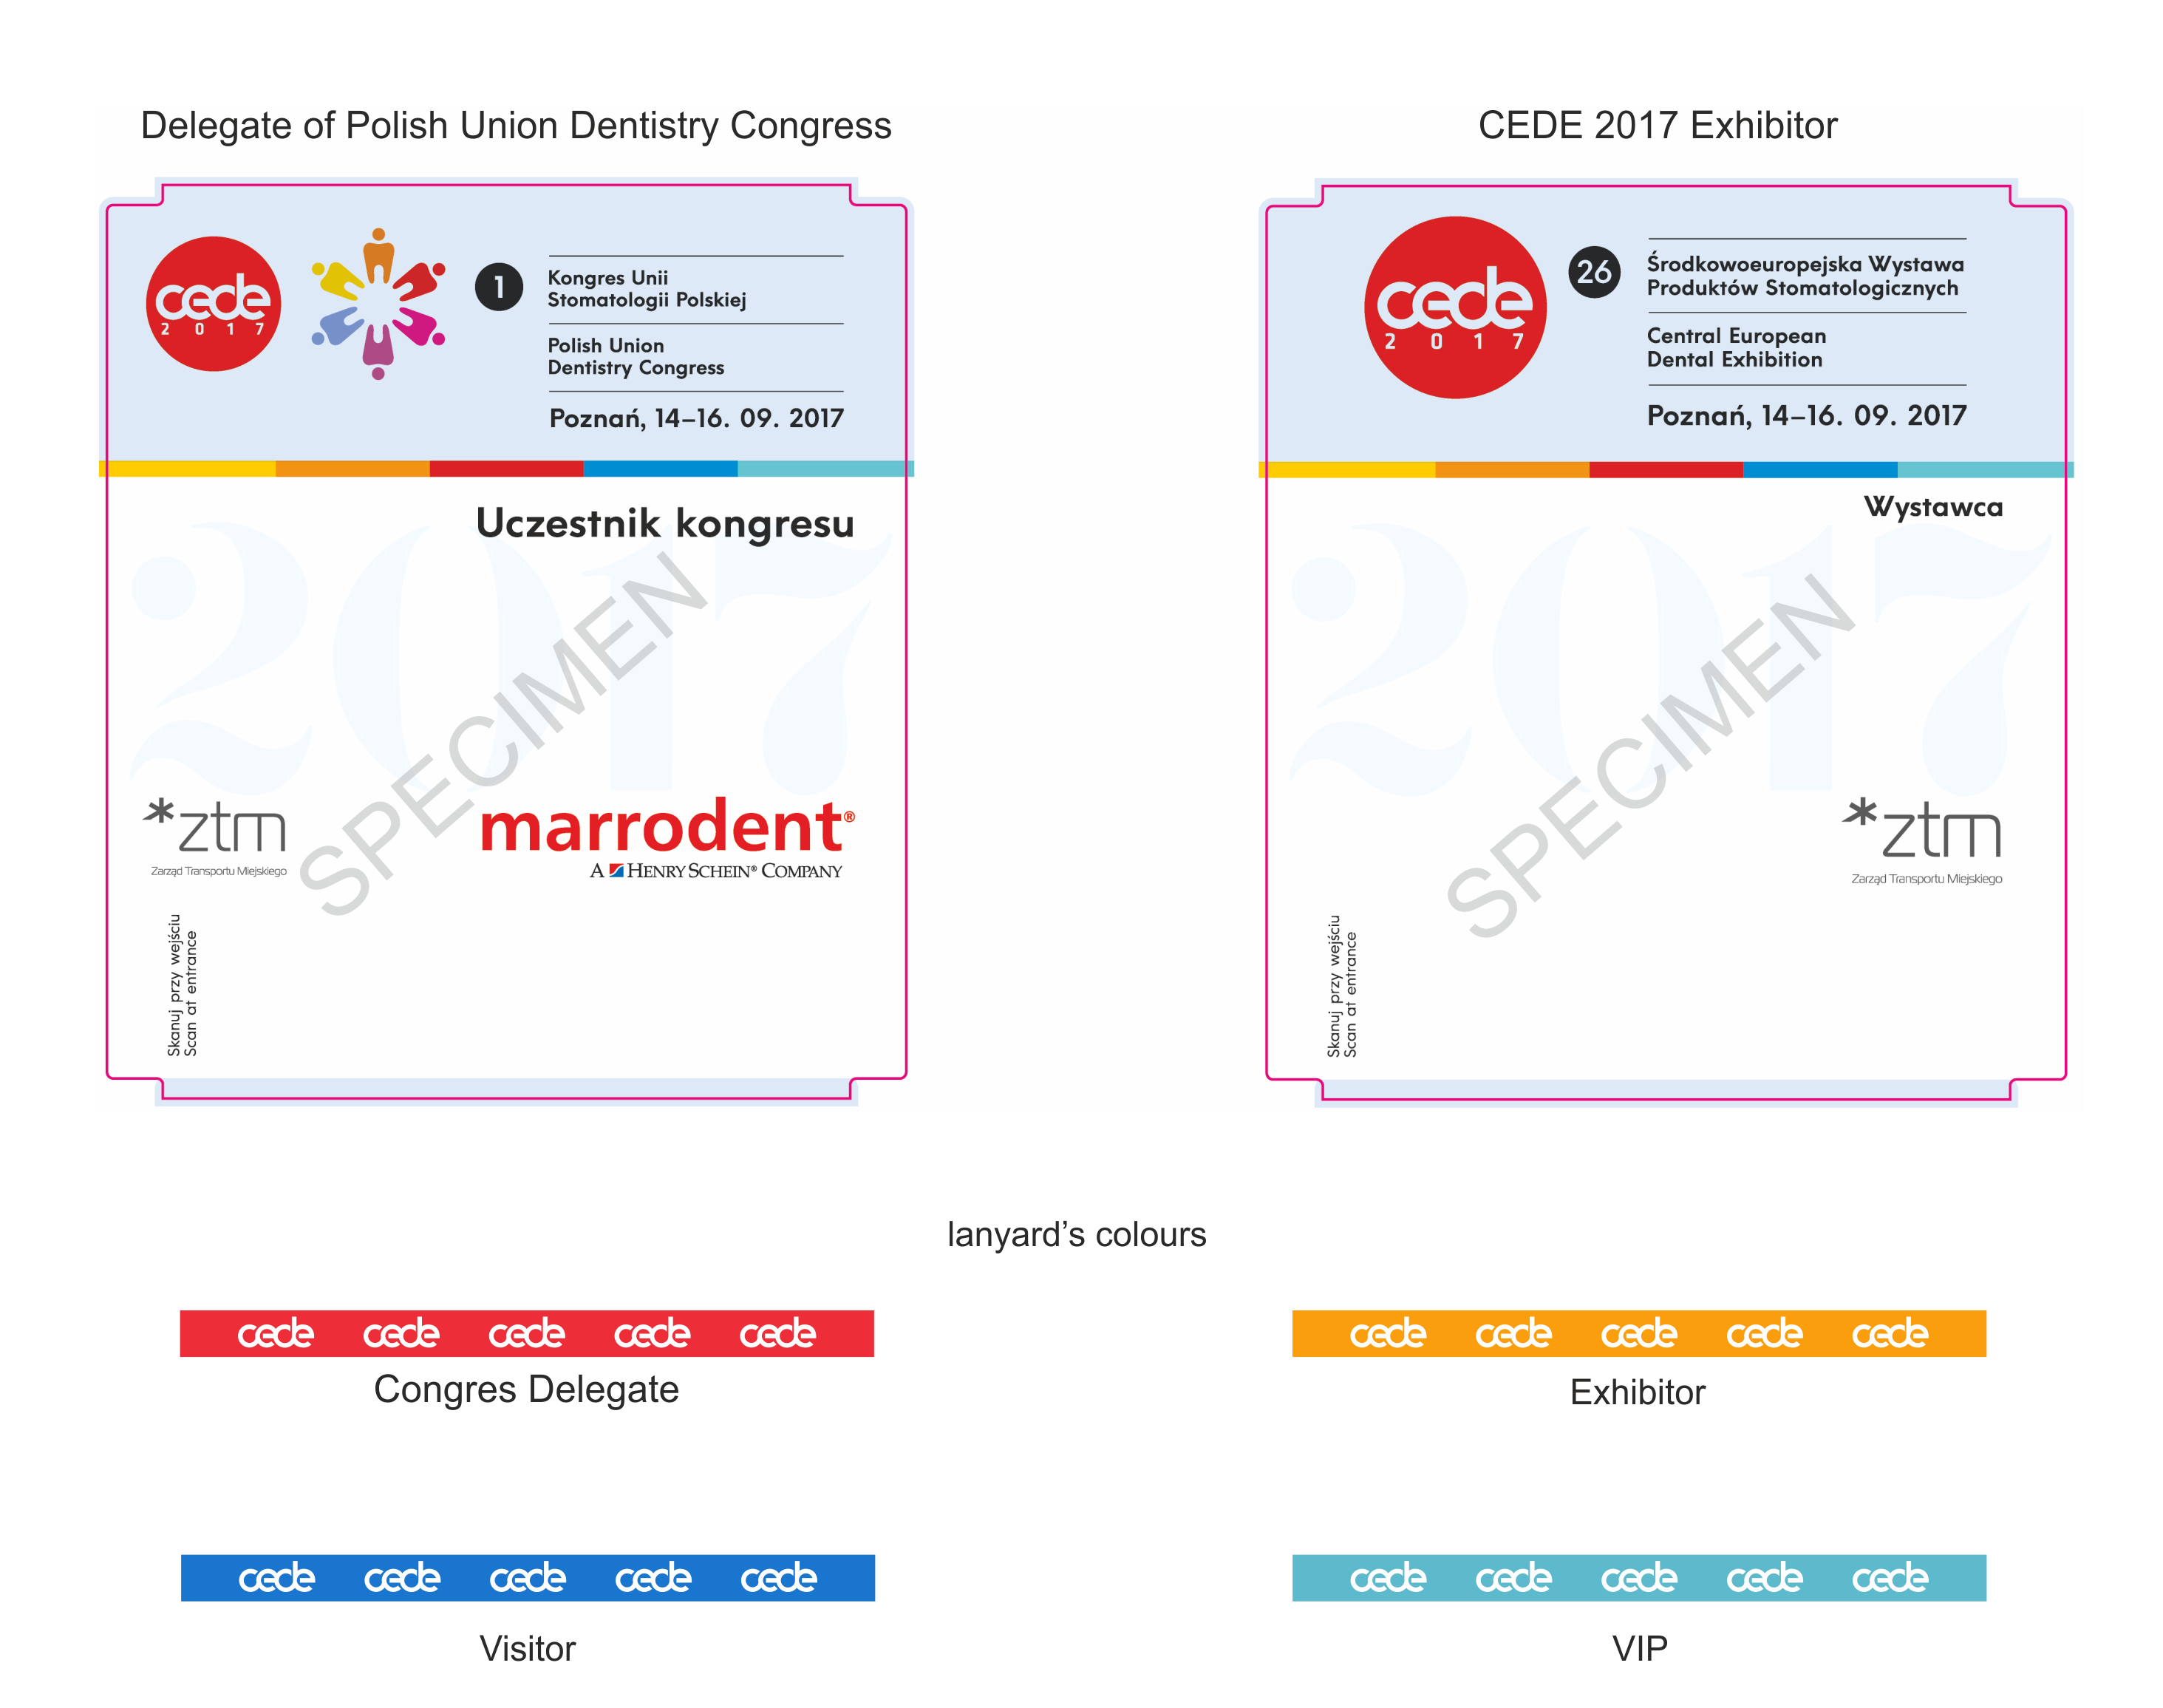 id_badges